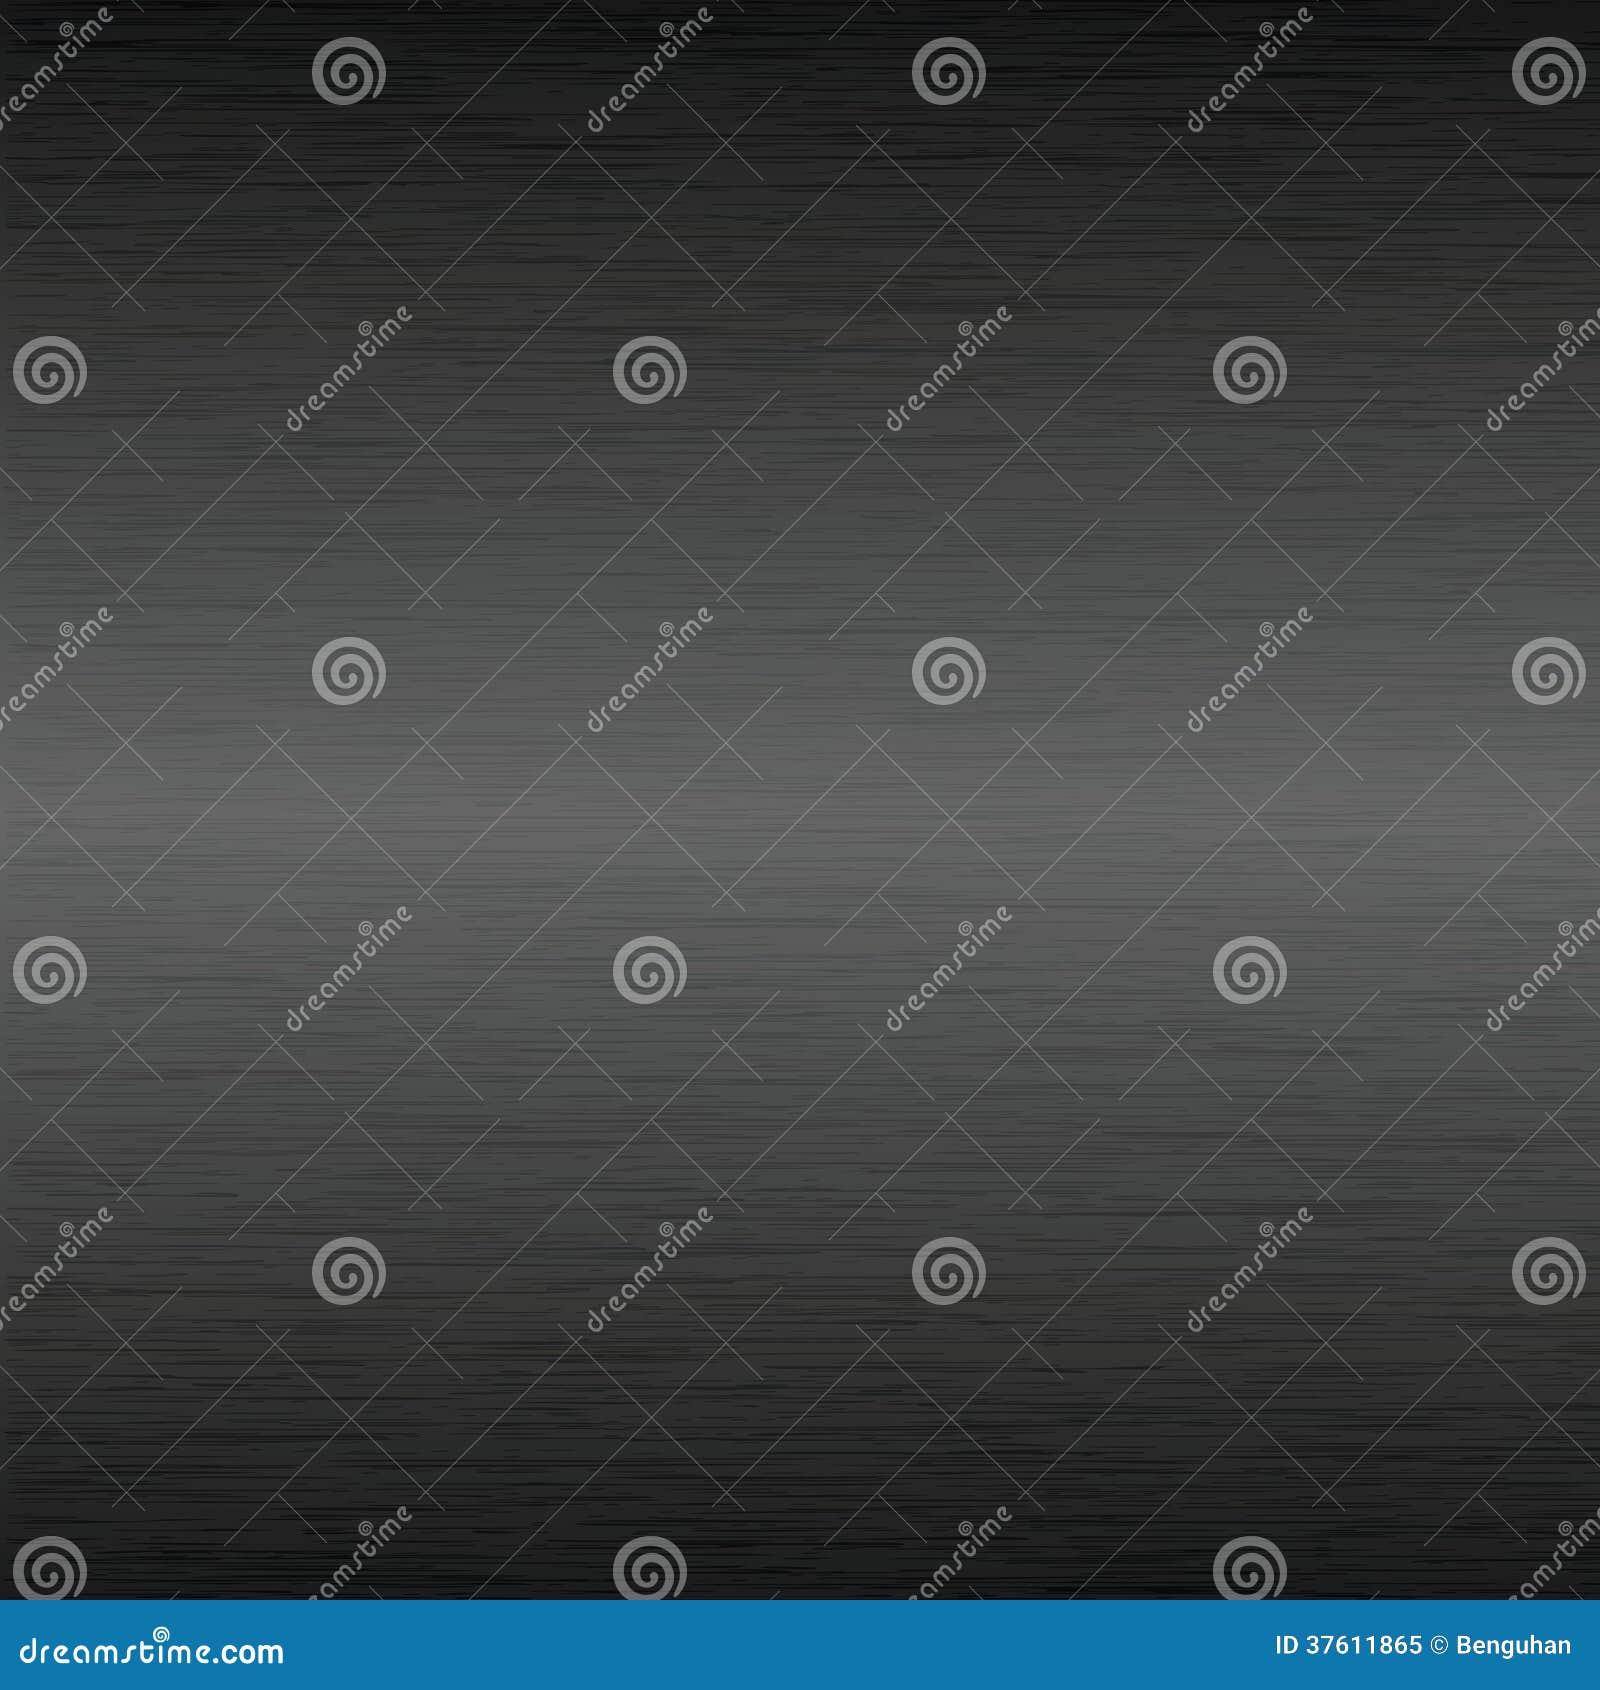 brushed metal background metal plate template stock illustration